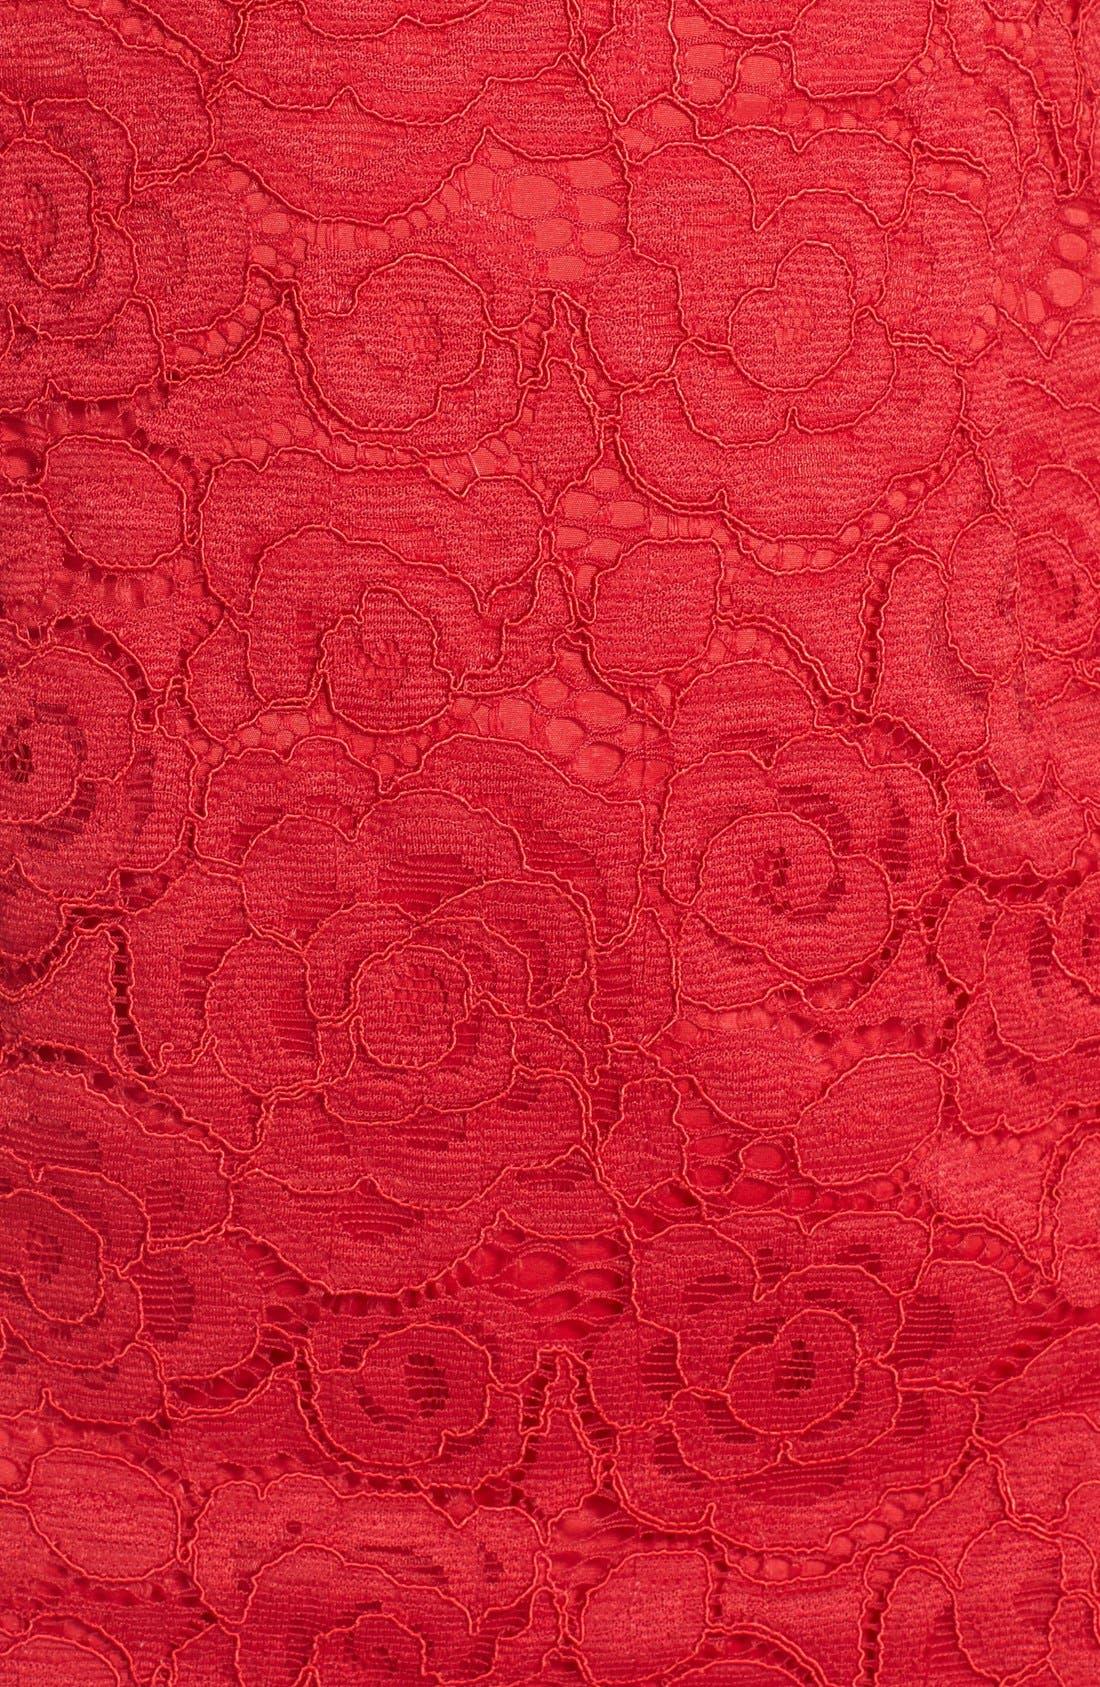 Off the Shoulder Lace Sheath Dress,                             Alternate thumbnail 17, color,